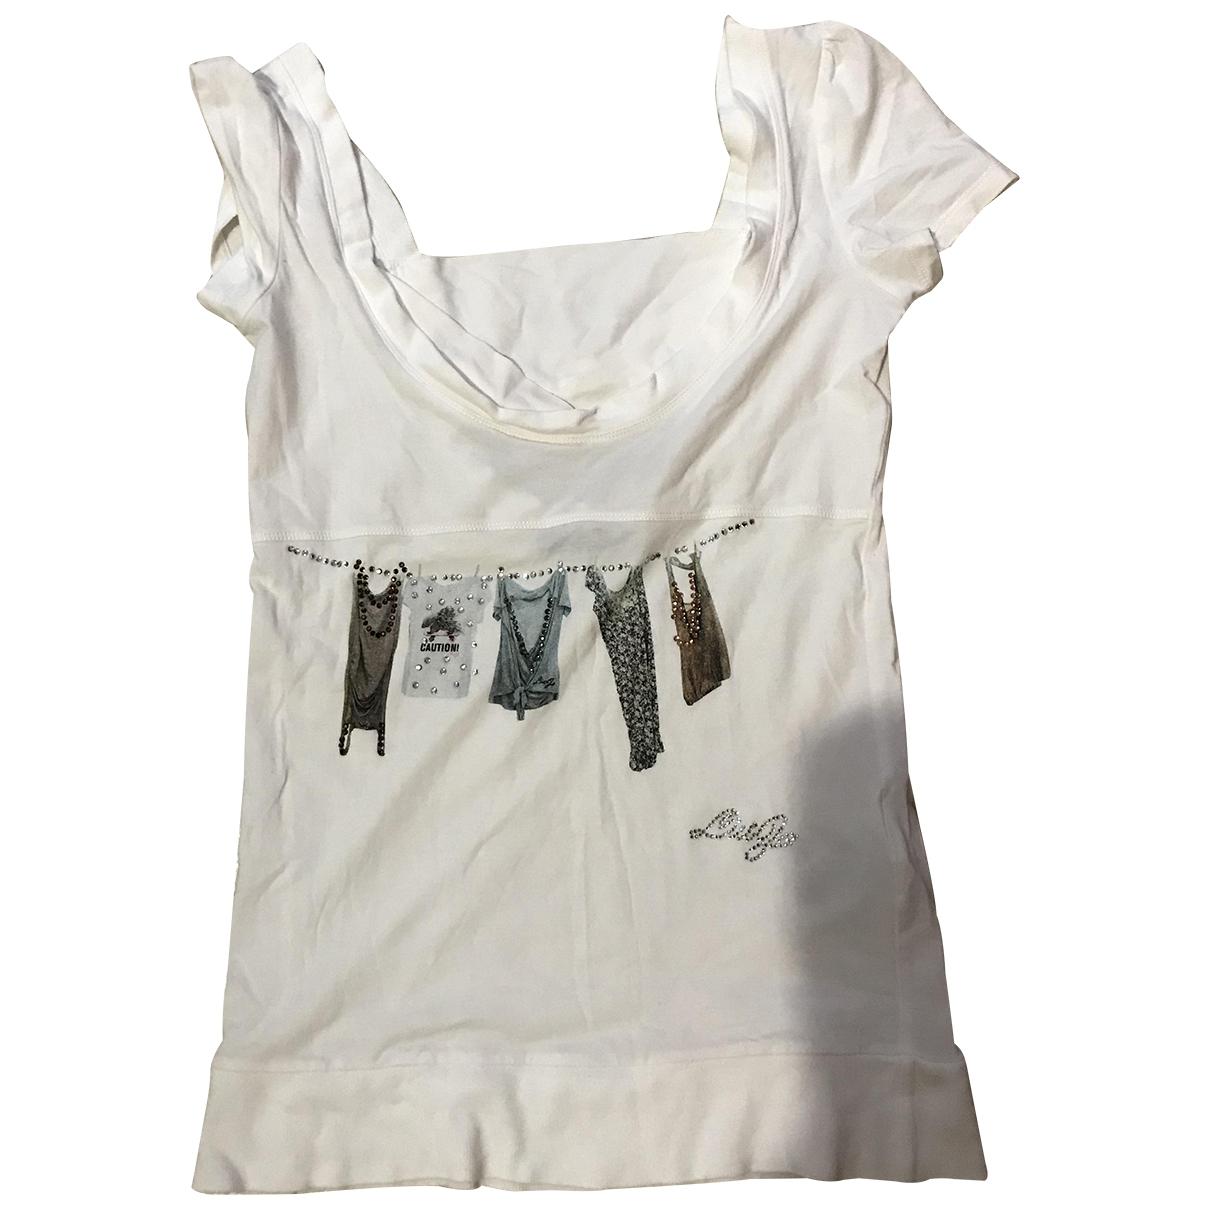 Liu.jo \N White Cotton  top for Women 44 IT